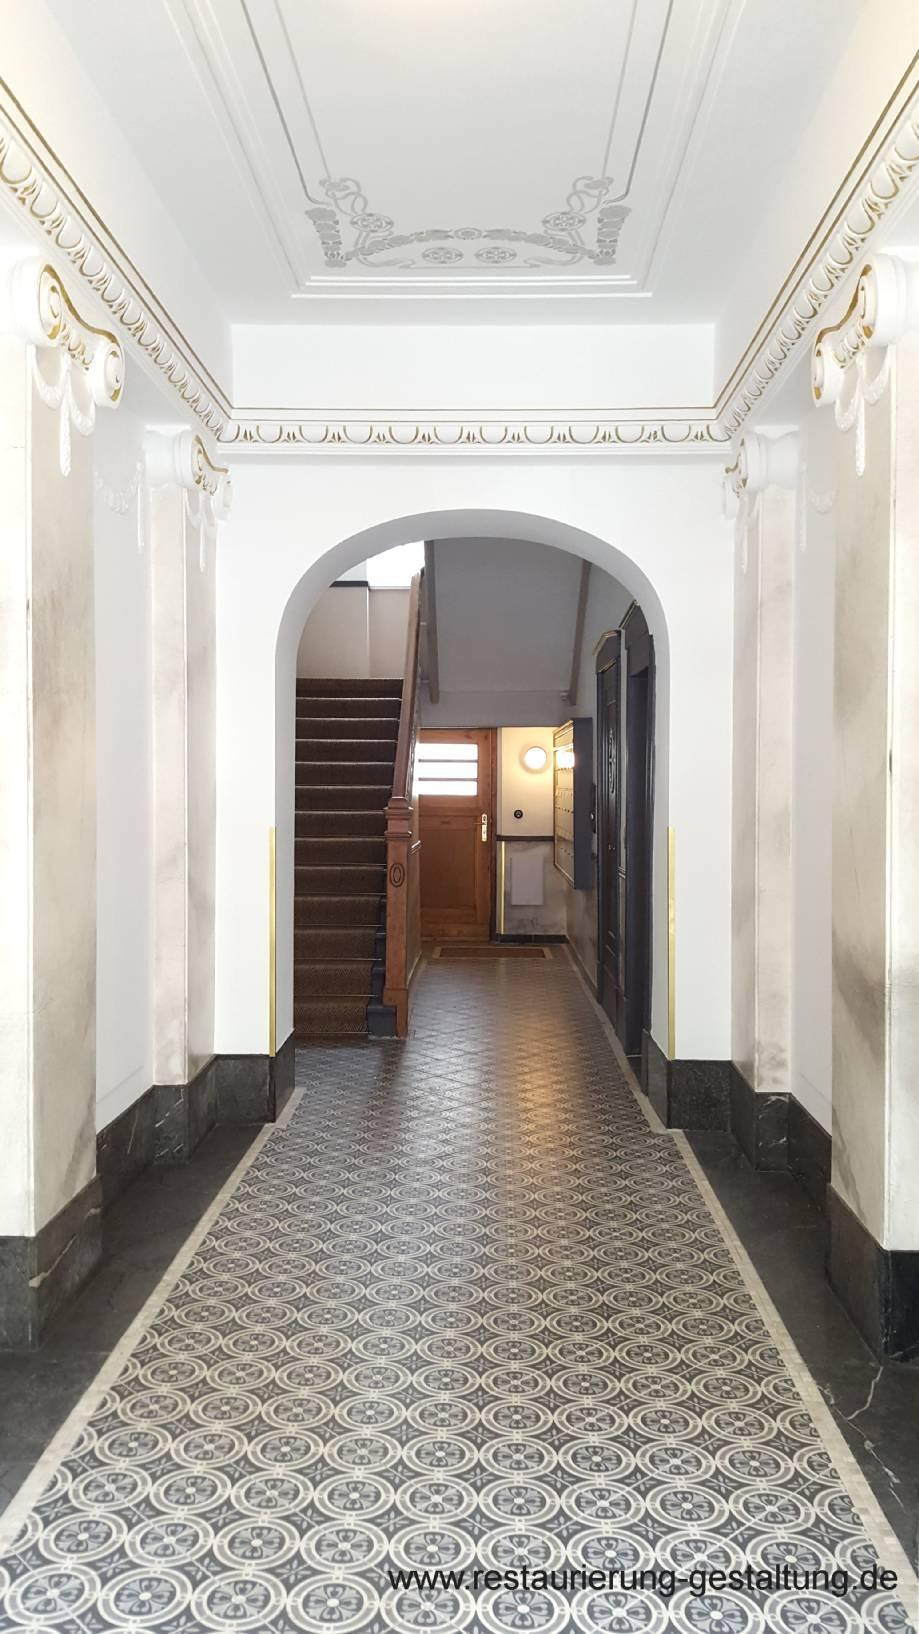 Treppenhaus / Marmormalerei / Restaurator / Deckenmalerei ... Gestaltung Treppenhaus Altbau